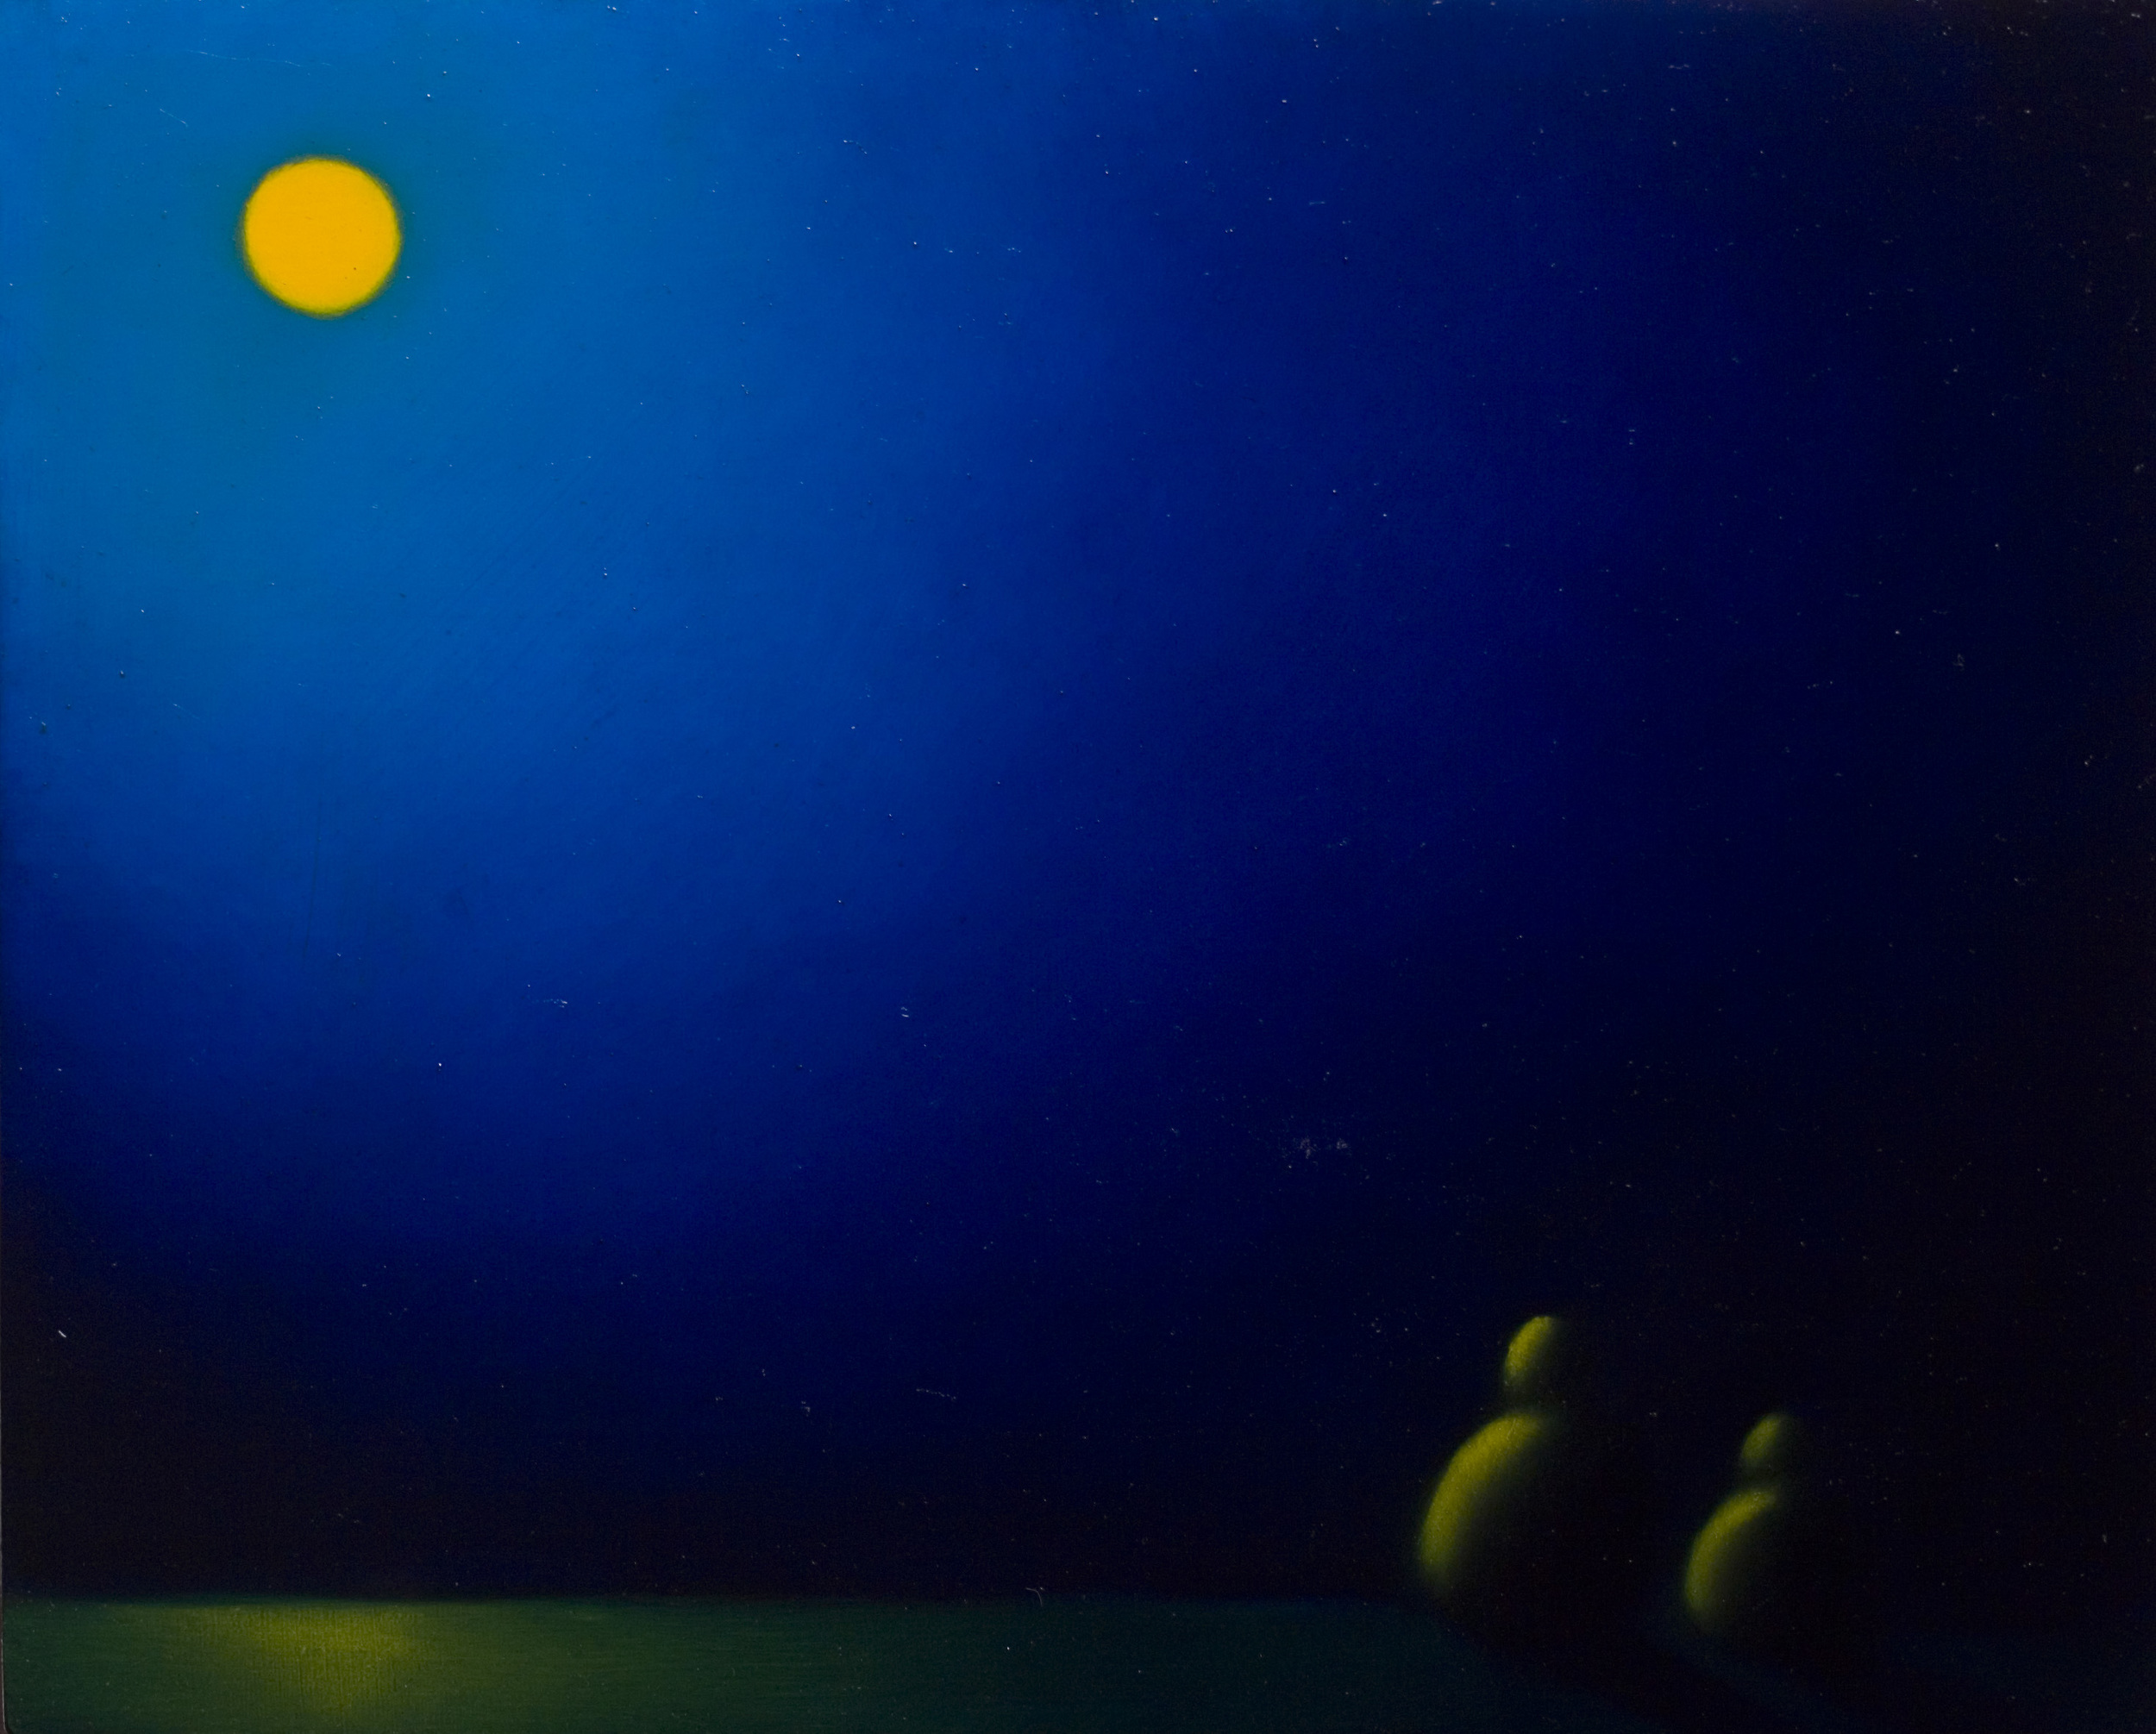 Moonlight • 8 x 10 • Panel • 500